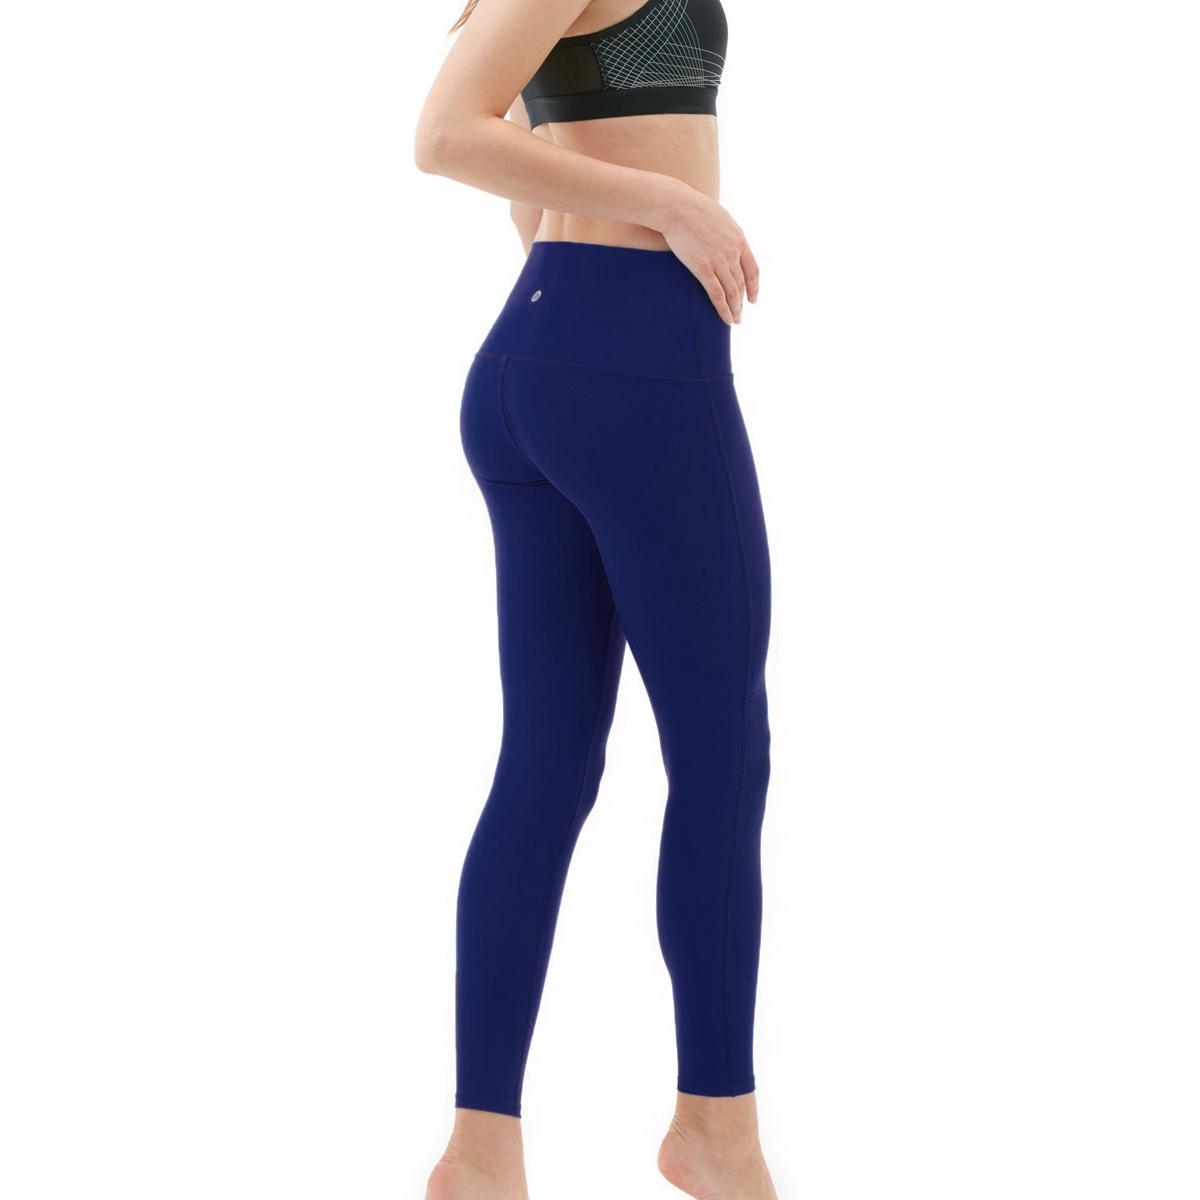 thumbnail 27 - TSLA Tesla FYP42 Women's High-Waisted Ultra-Stretch Tummy Control Yoga Pants